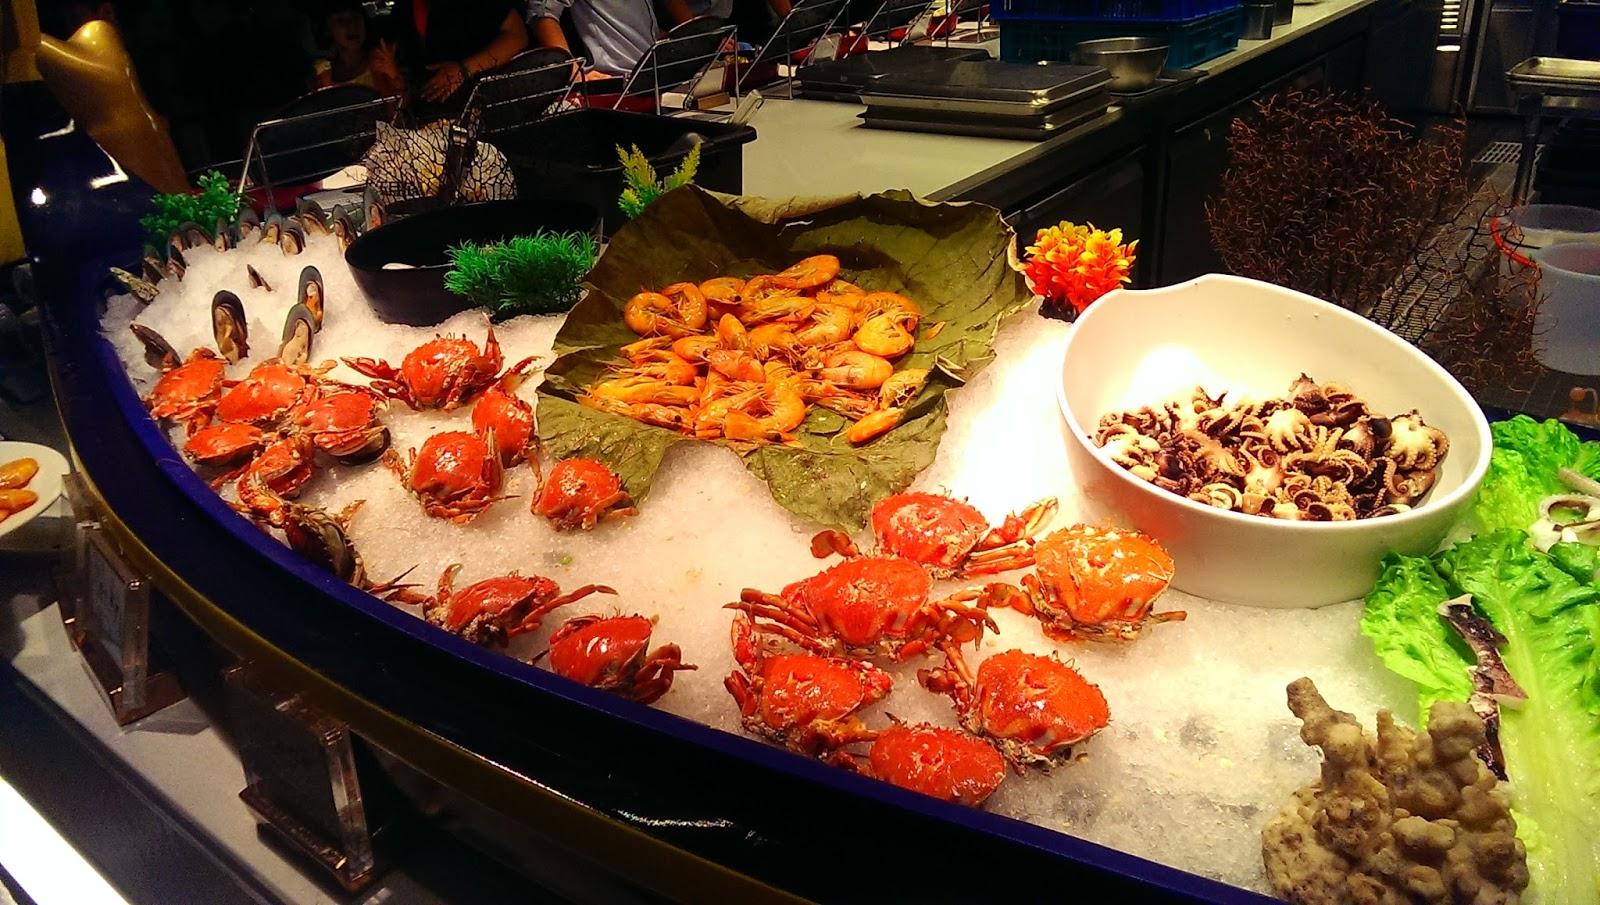 2015 07 01%2B20.03.12 - [食記] 台北京站 - 饗食天堂,有生魚片吃到飽的高級自助餐廳!